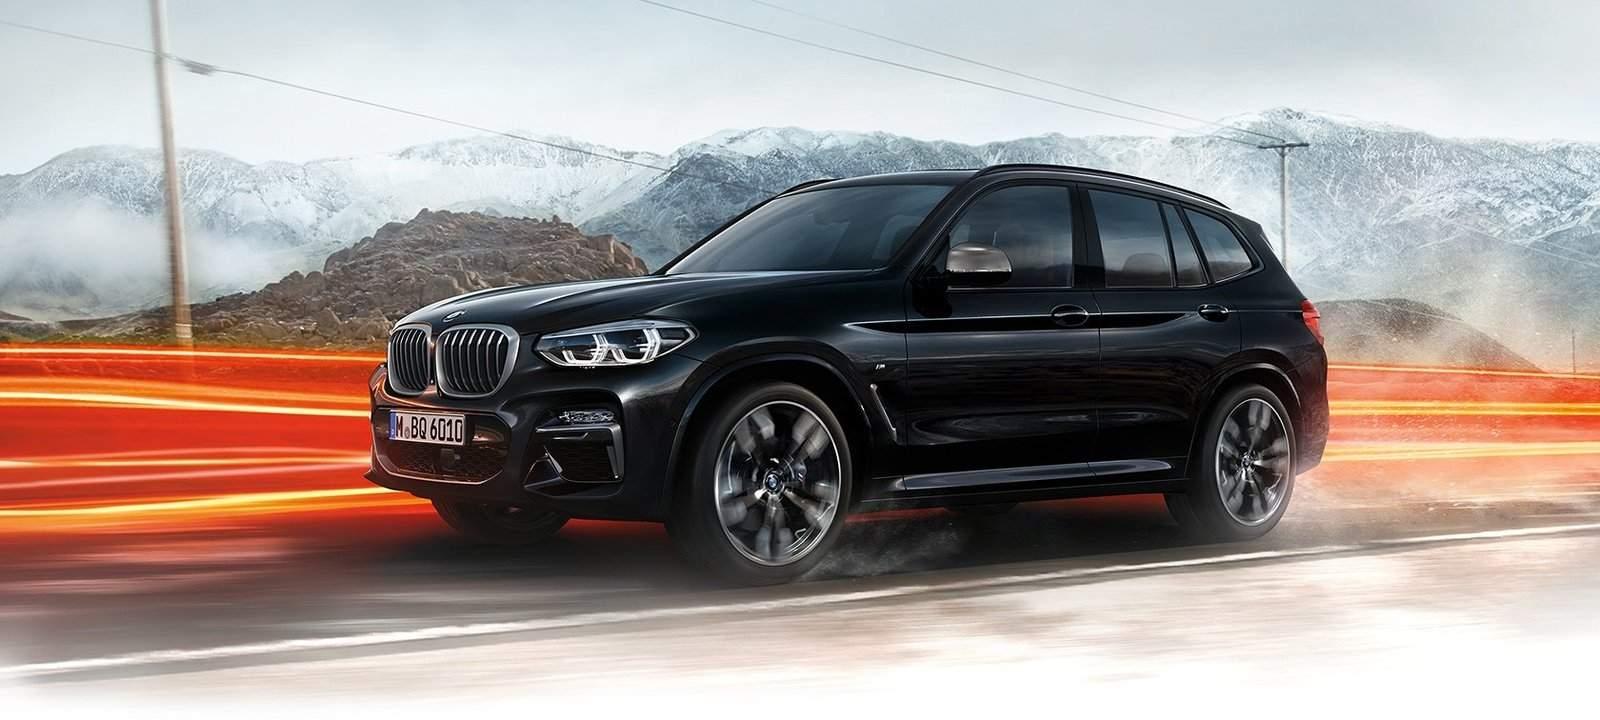 BMW X3 leaked 5